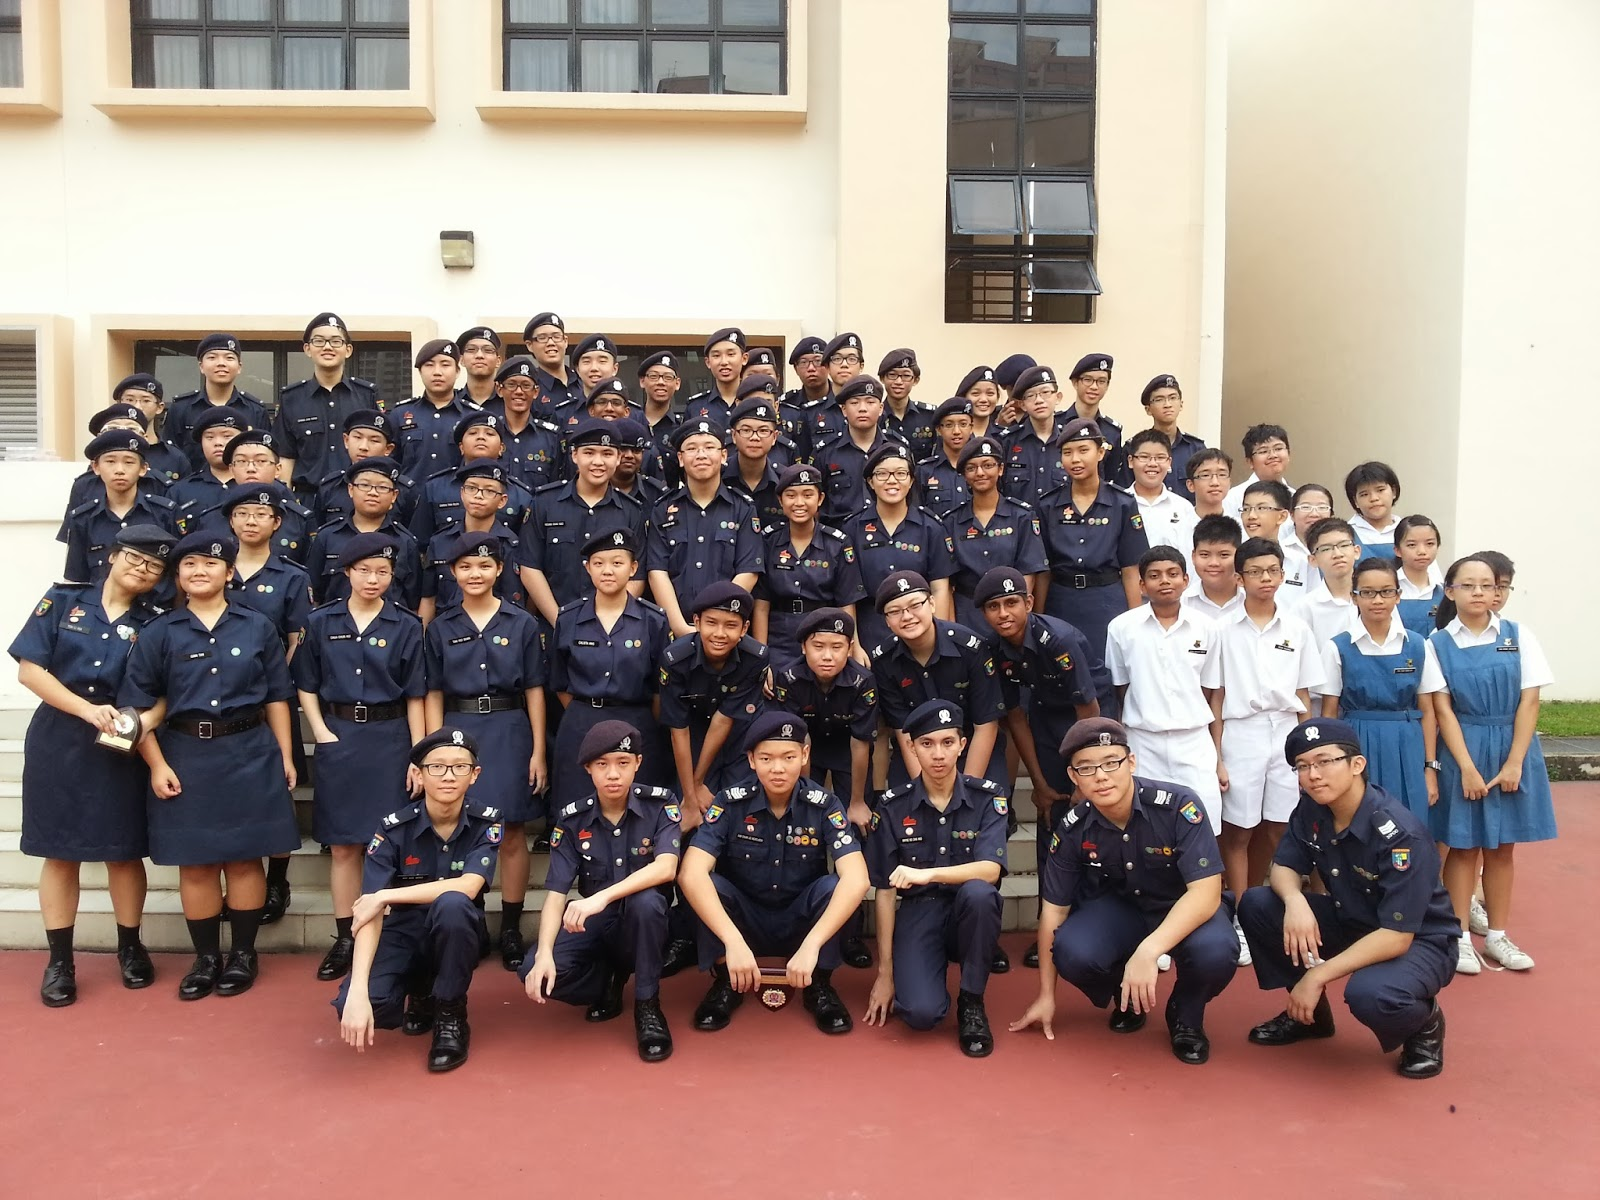 Anderson Secondary School NPCC Unit: Photos of 2013